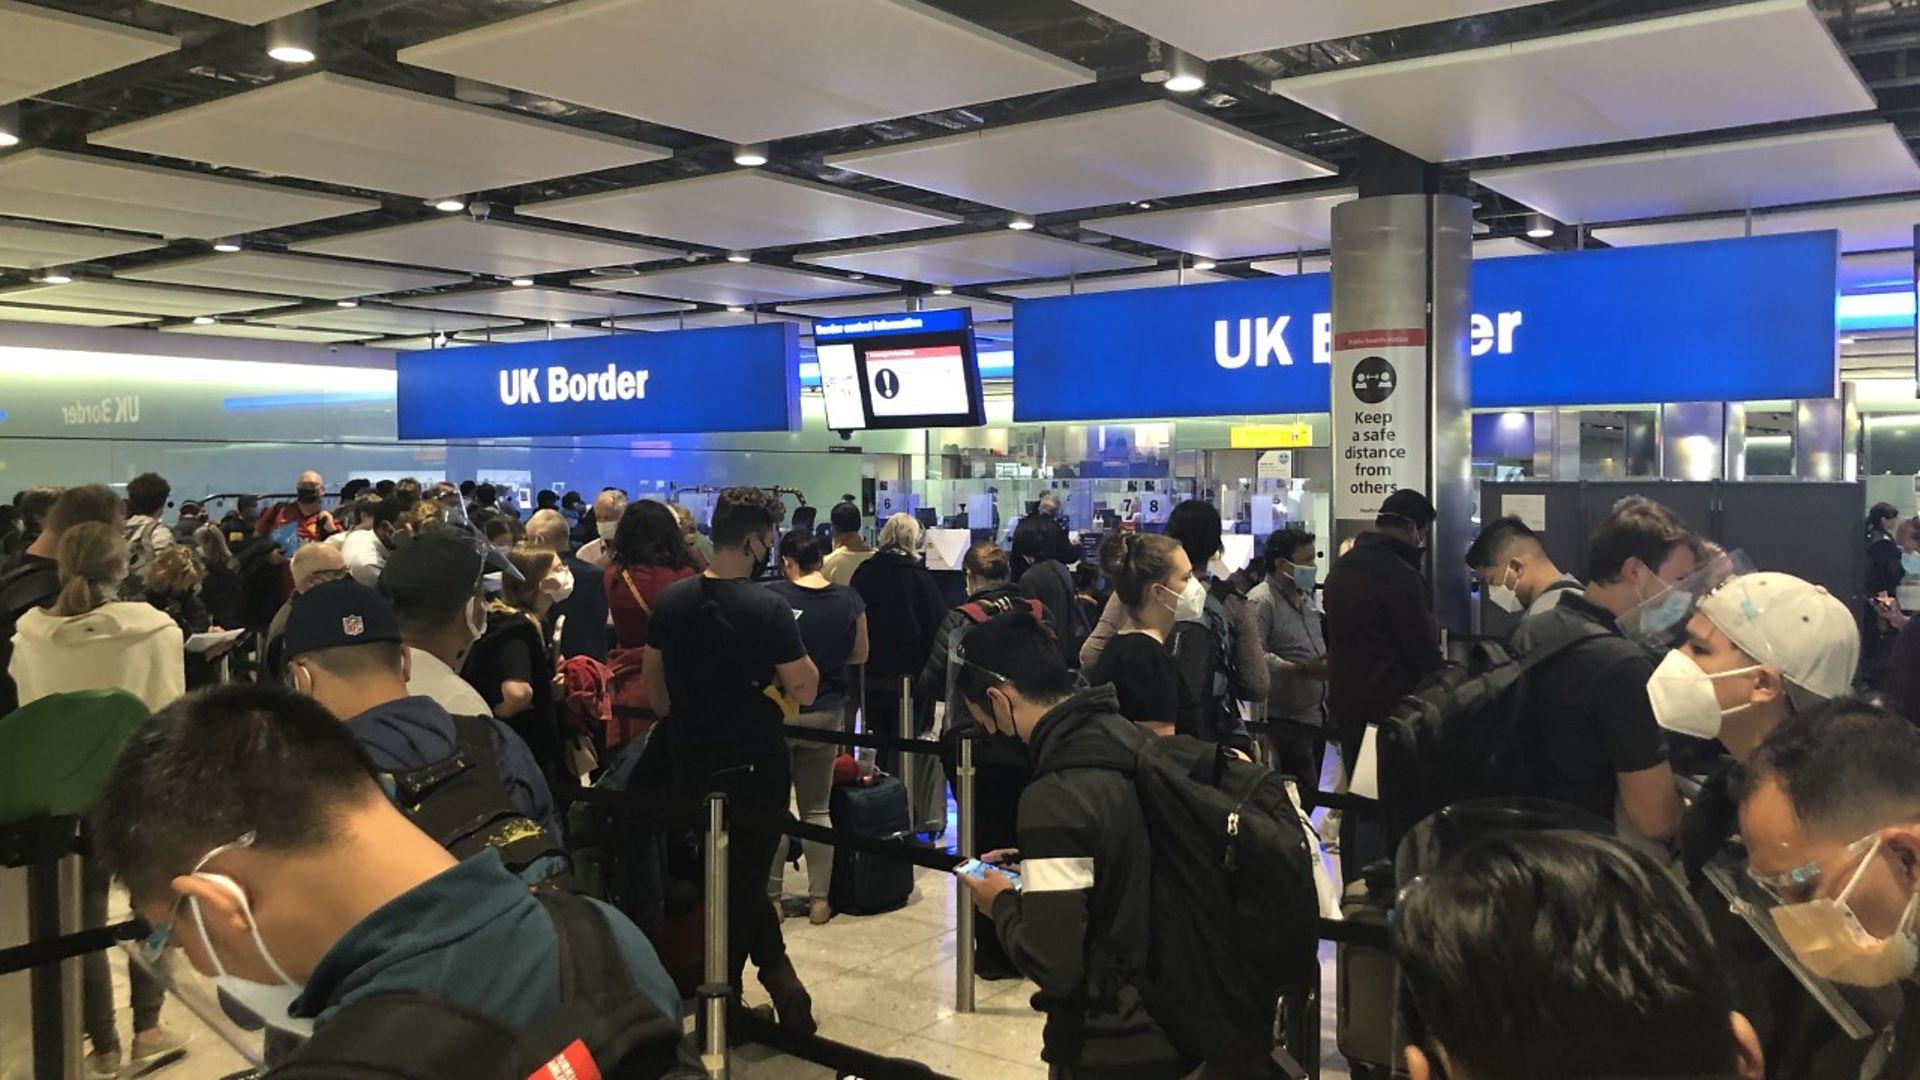 Dense crowds in the customs hall at Heathrow - Credit: Geoff McDonald